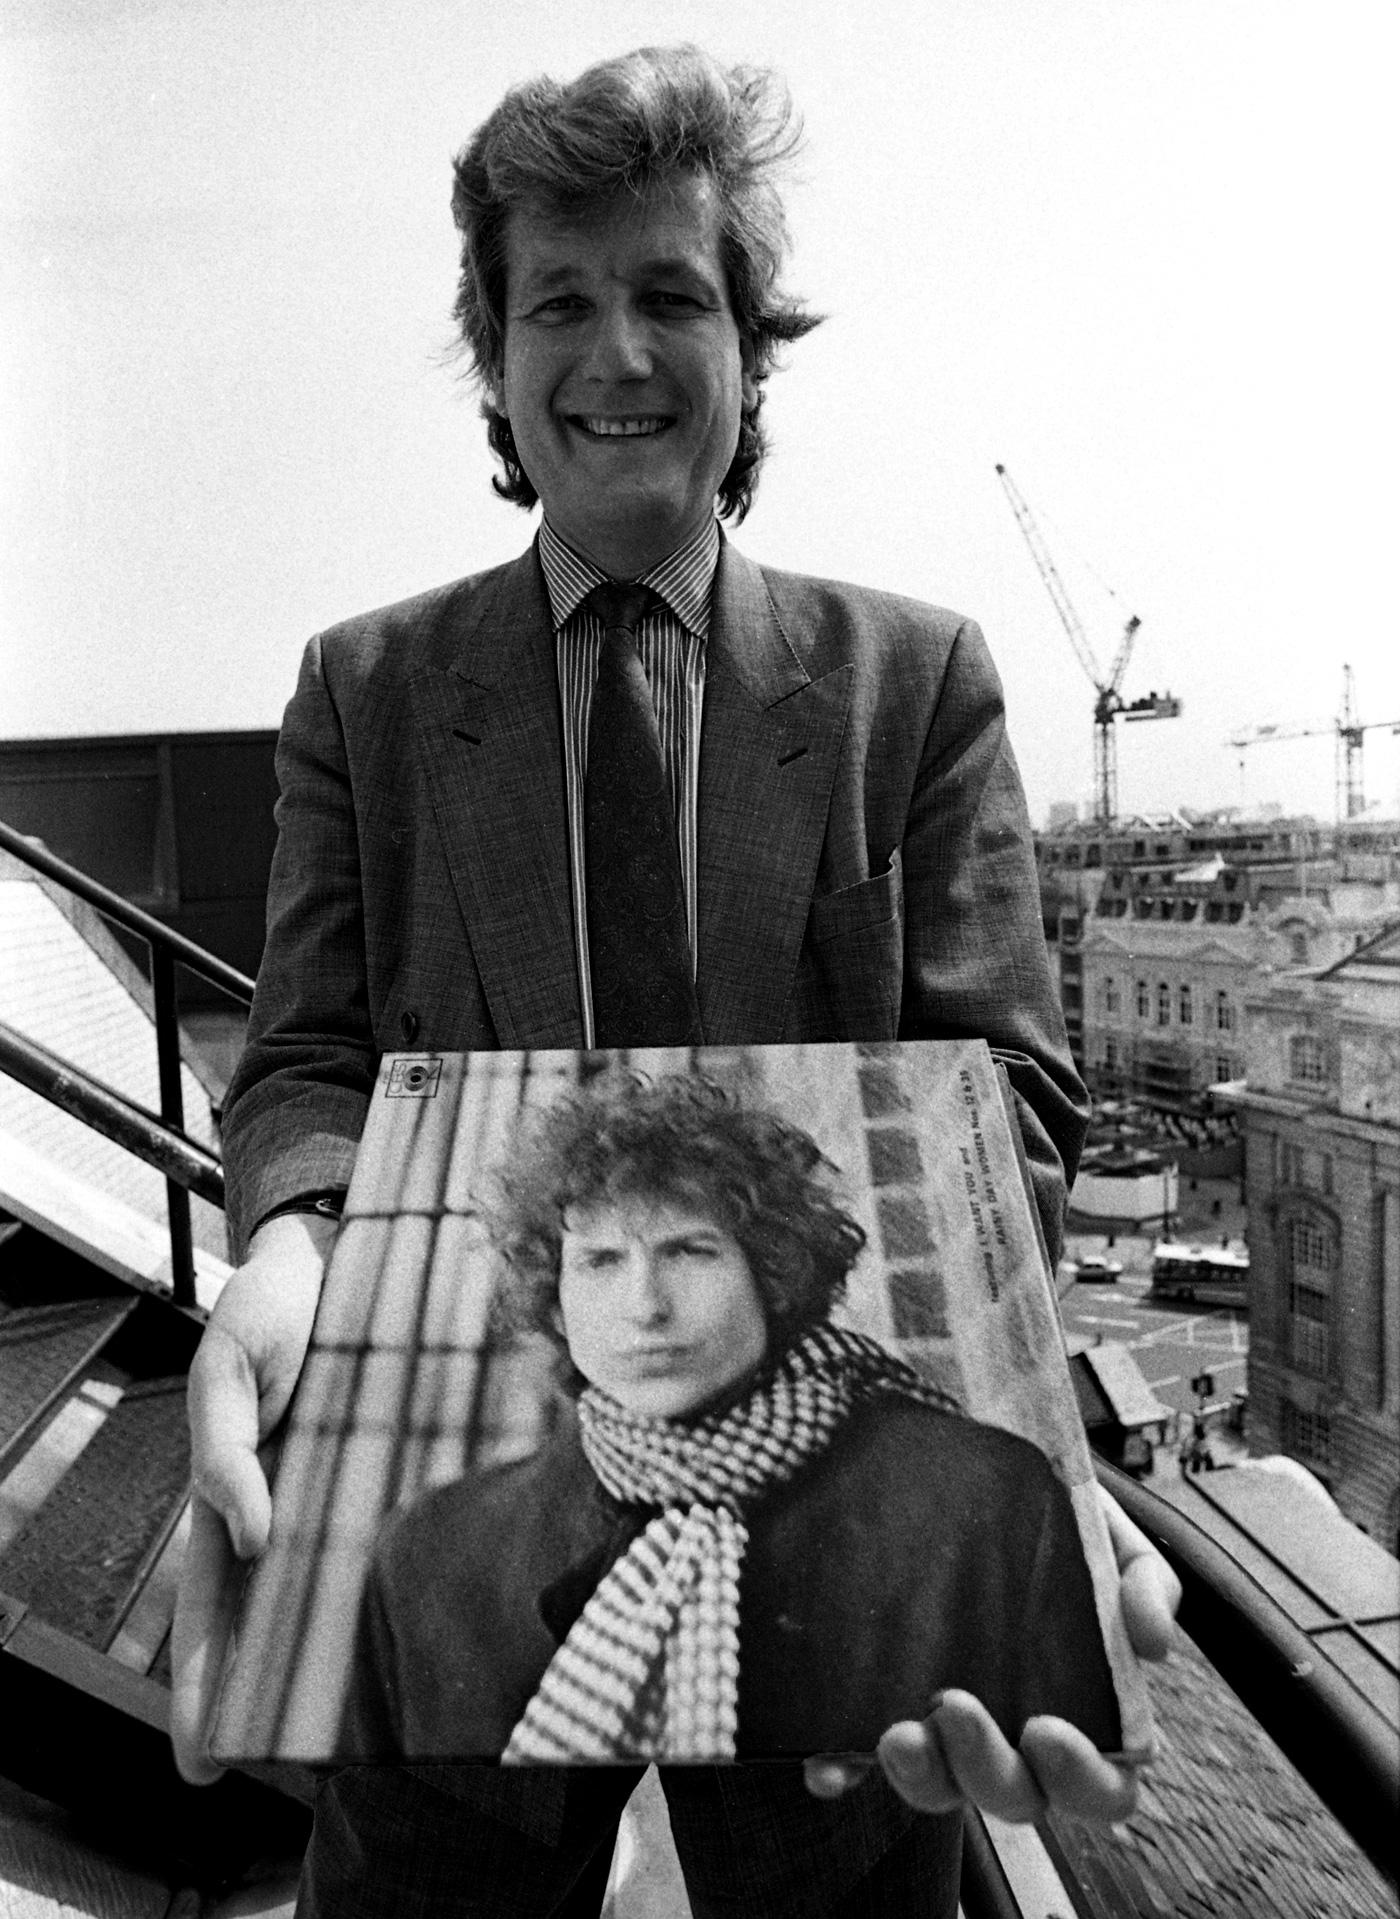 Robert George Dylan Willis with an album by Robert Allen Zimmerman, aka Bob Dylan